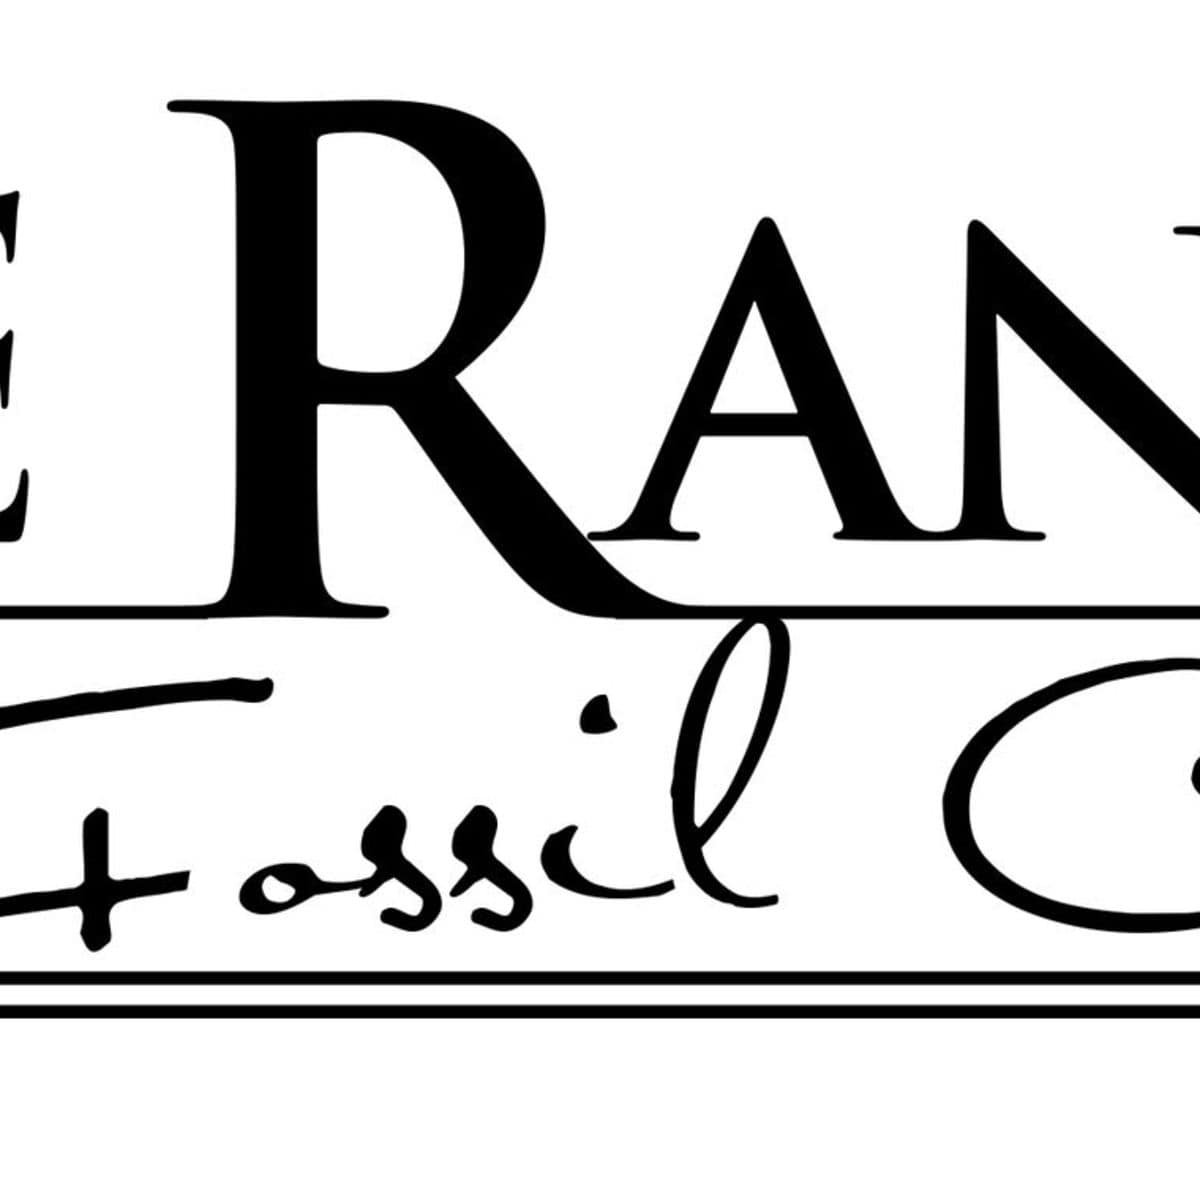 Contact Us Ranch At Fossil Creek   Ranch At Fossil Creek ...